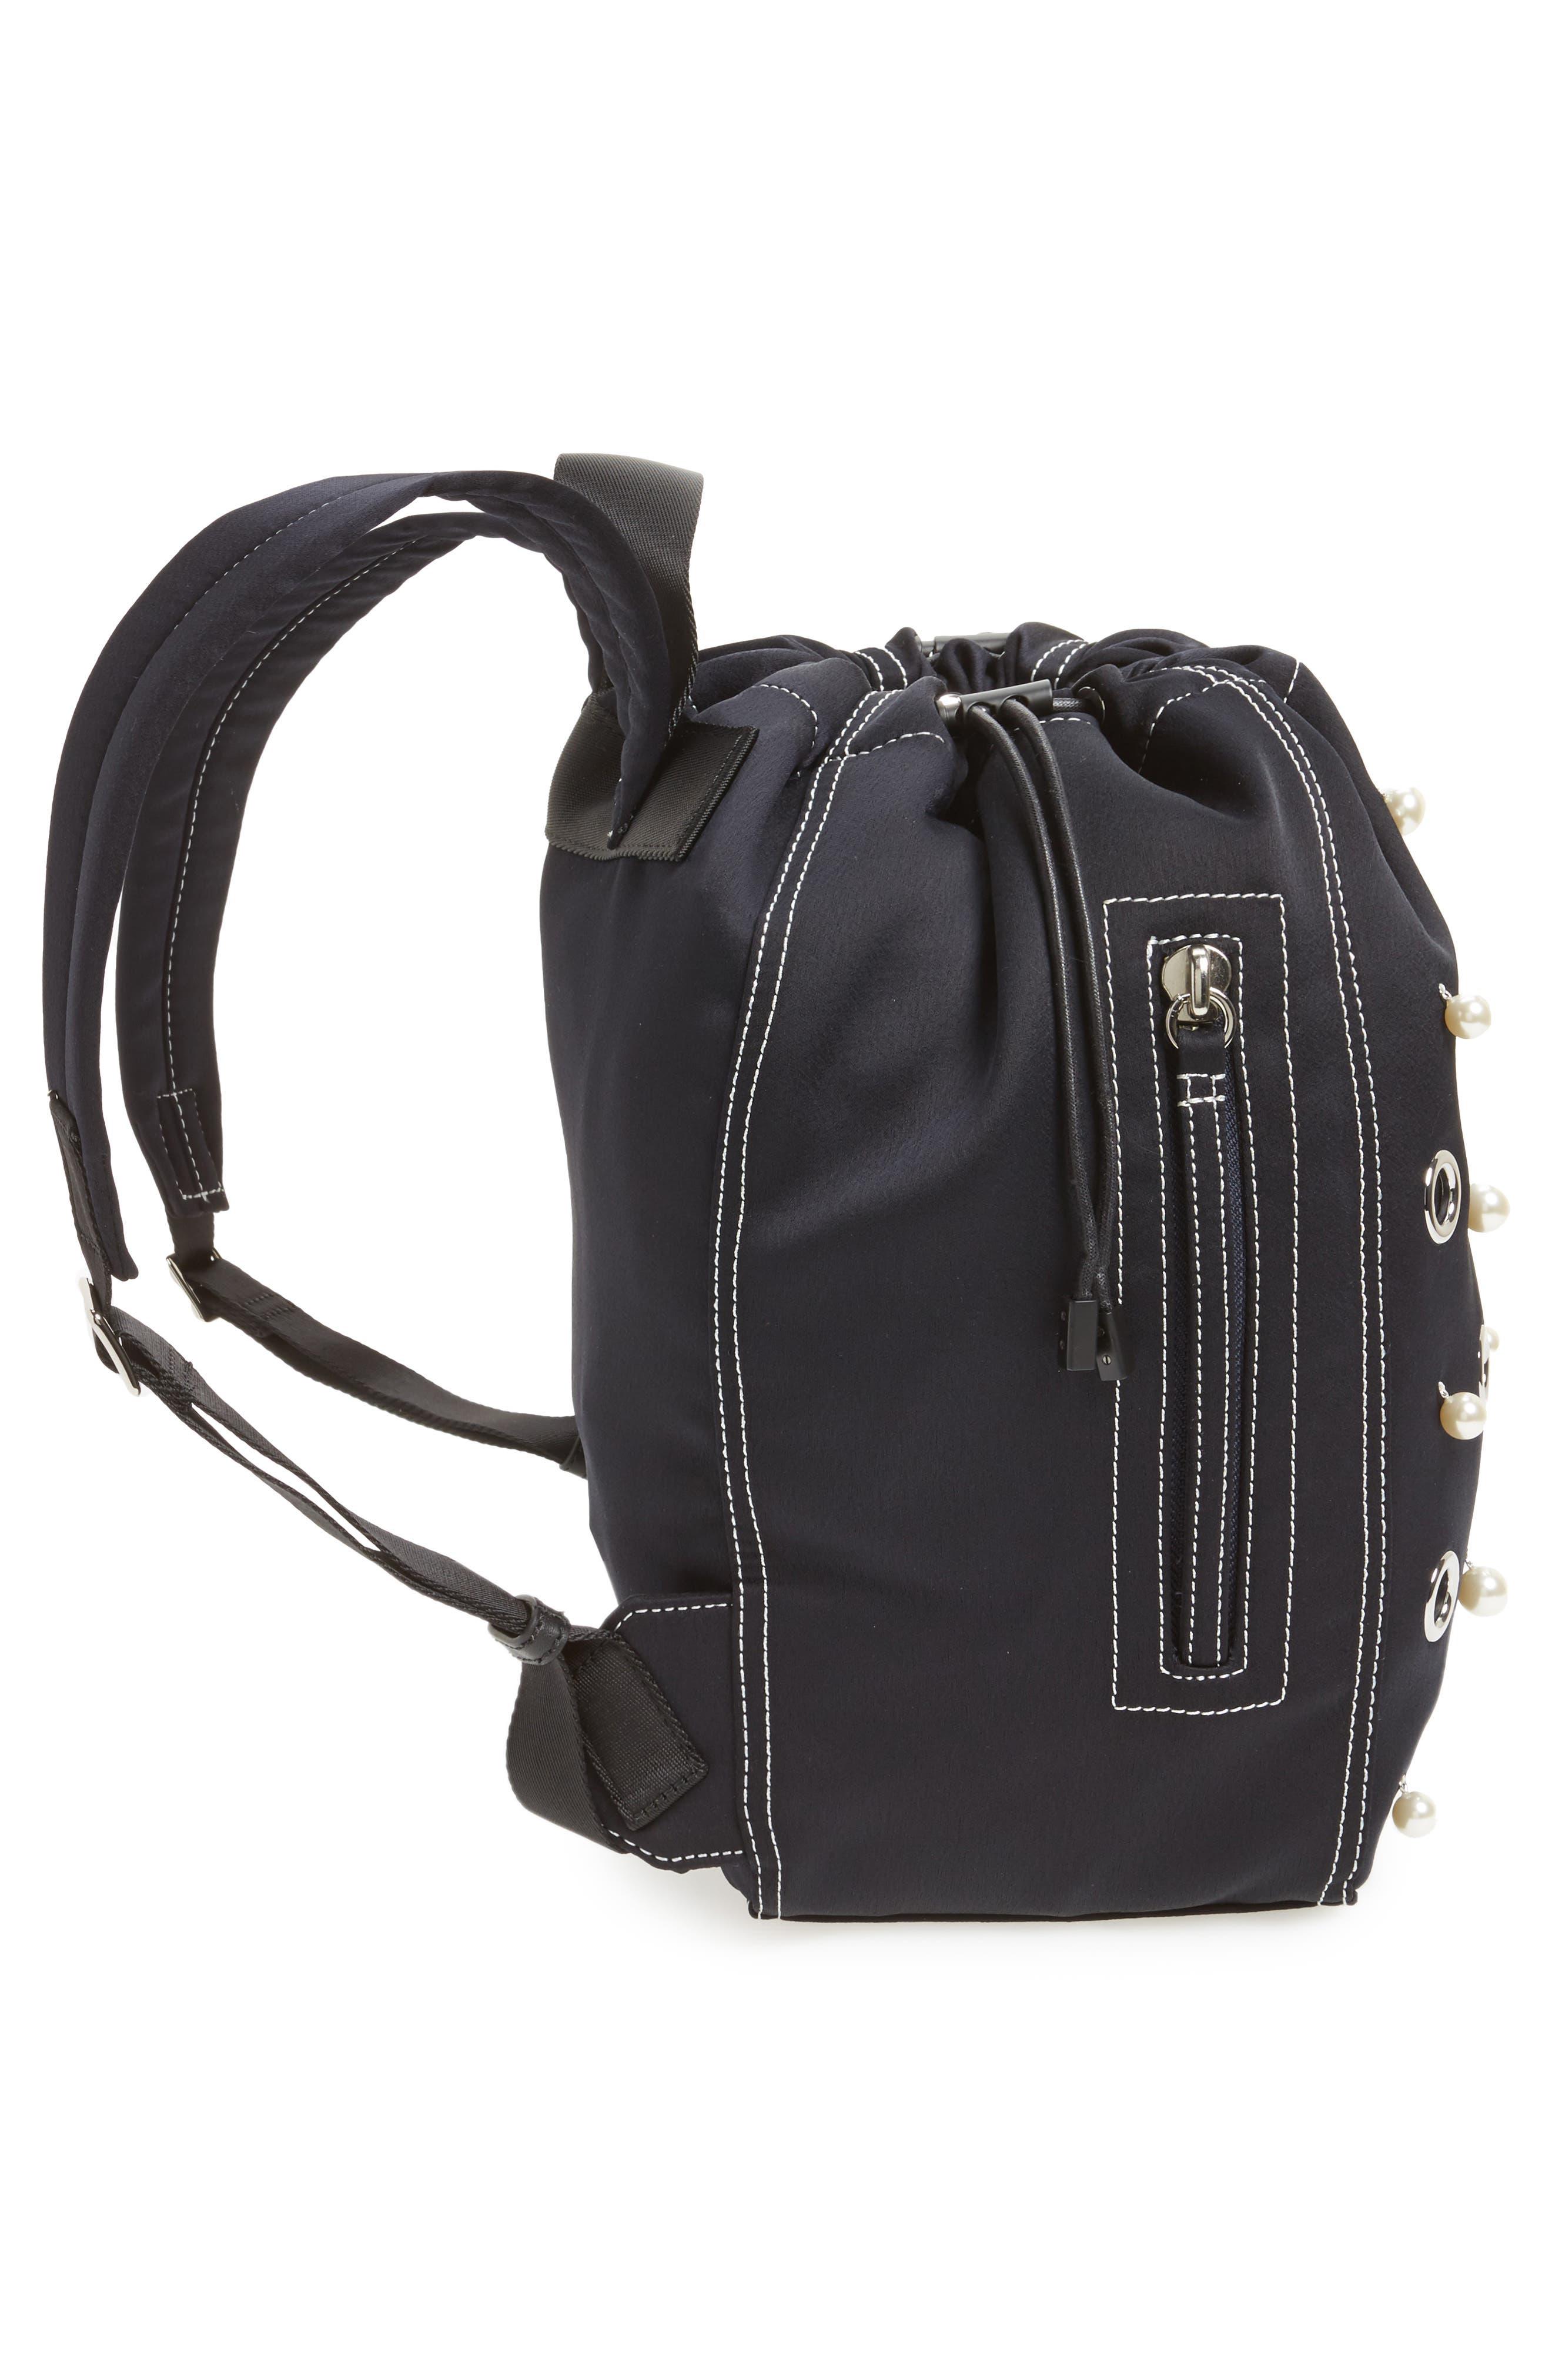 Phillip Lim 3.1 Medium Go-Go Embellished Backpack,                             Alternate thumbnail 10, color,